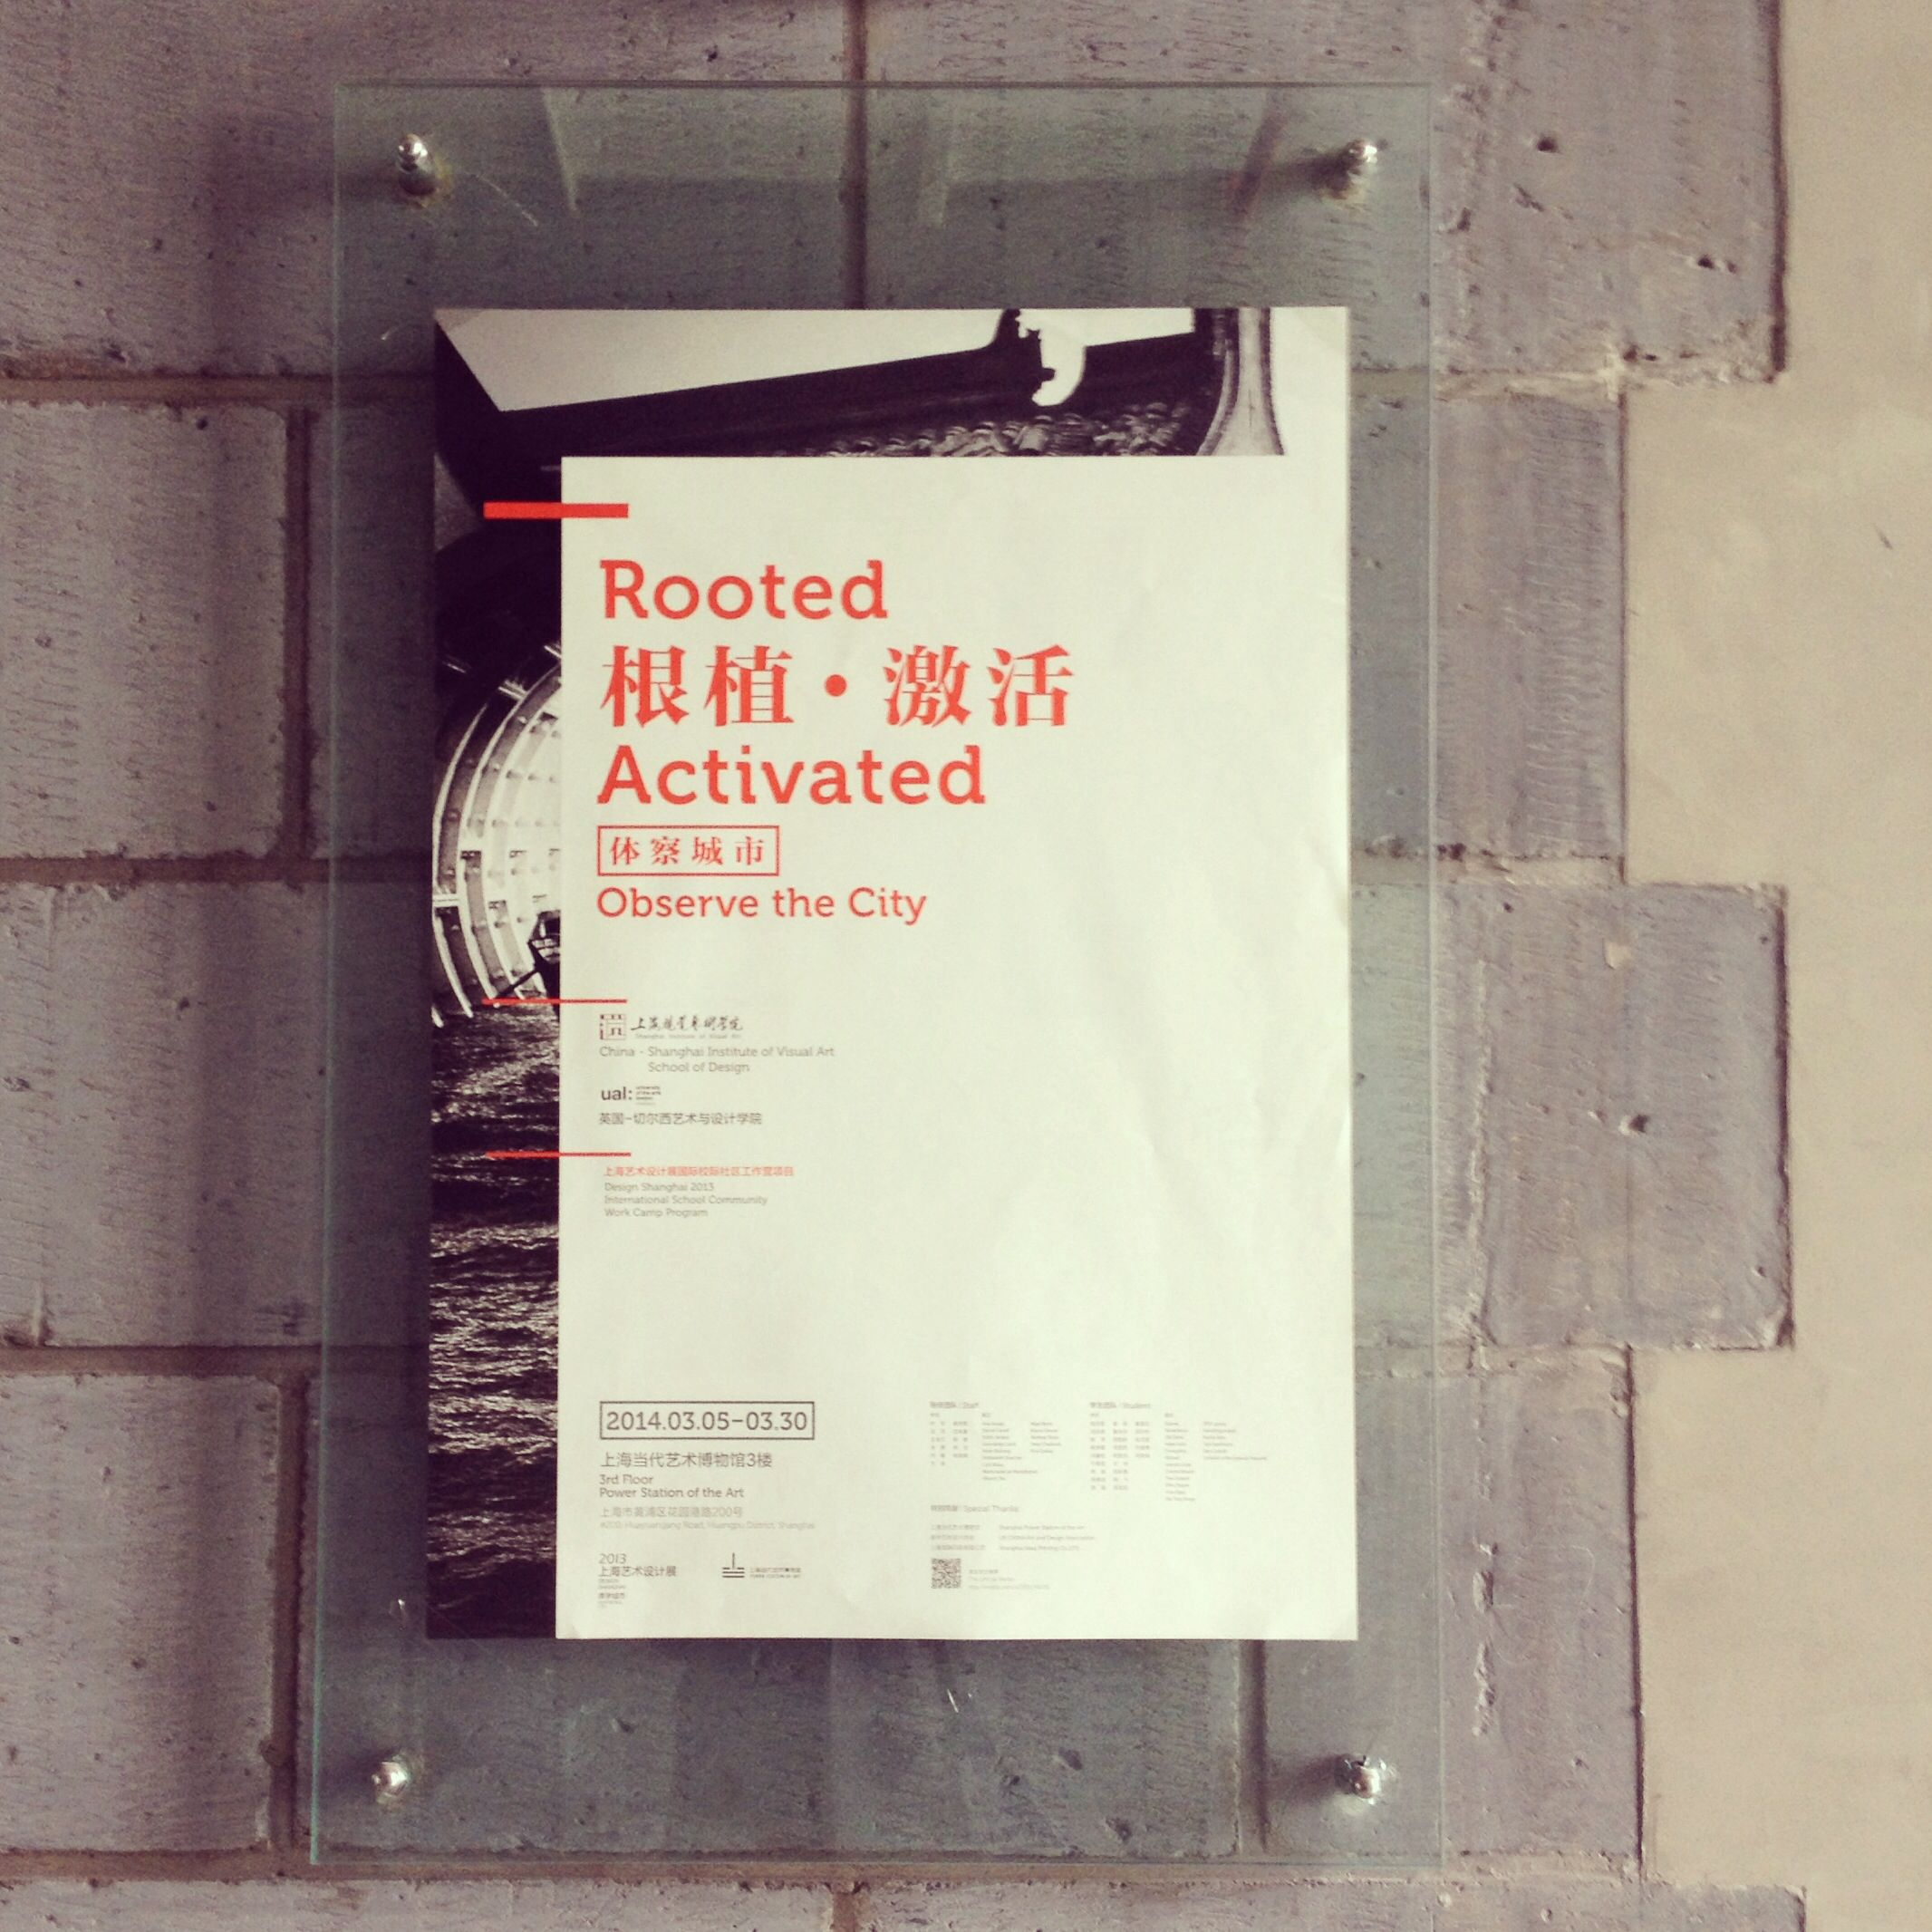 Inter University Collaboration Program Between Siva Shanghai